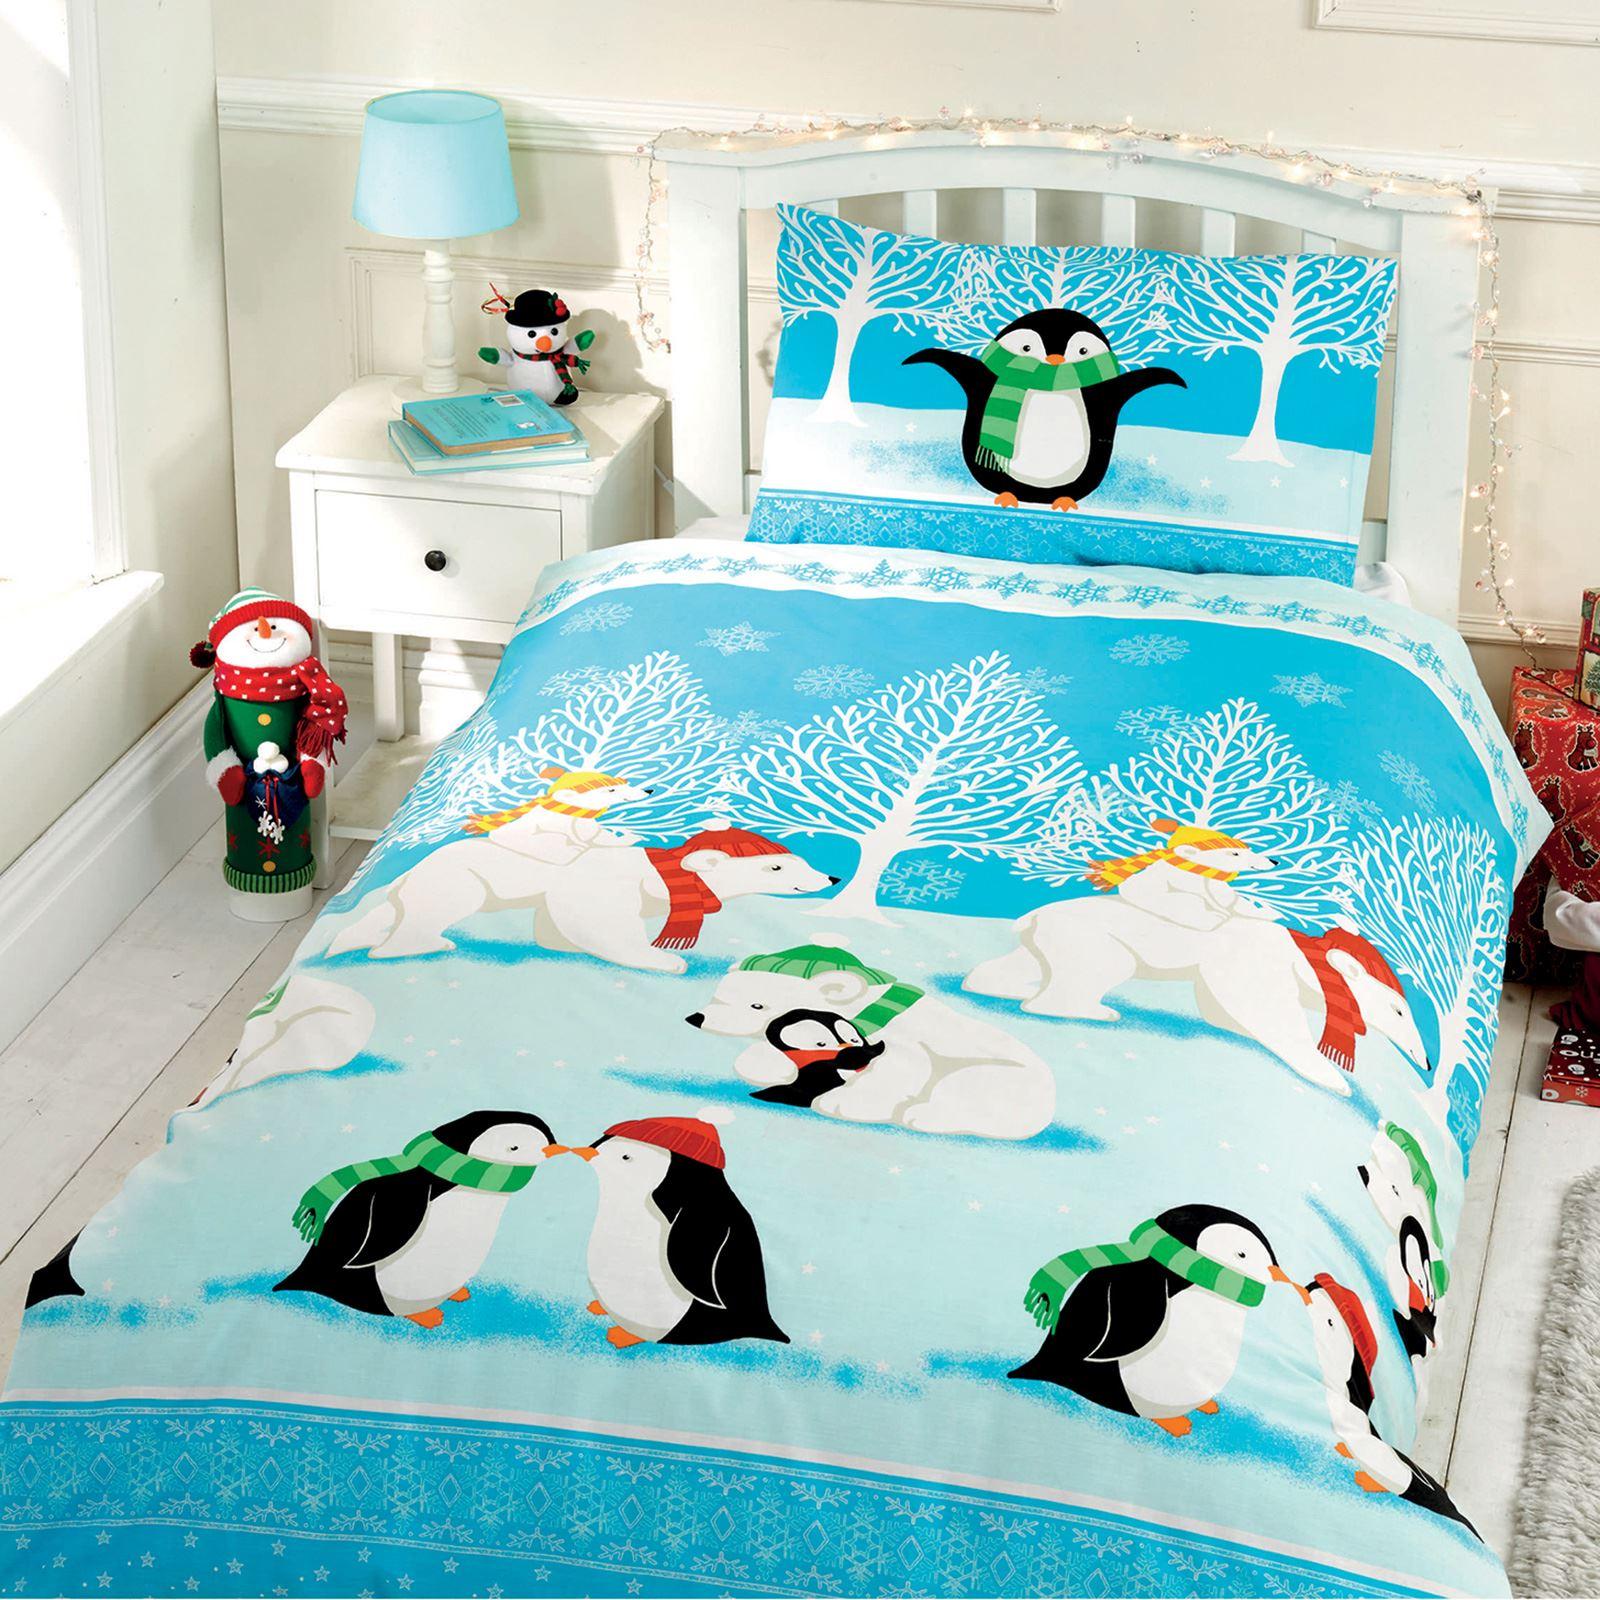 Christmas Duvet Cover Sets Bedding Kids Santa Reindeer